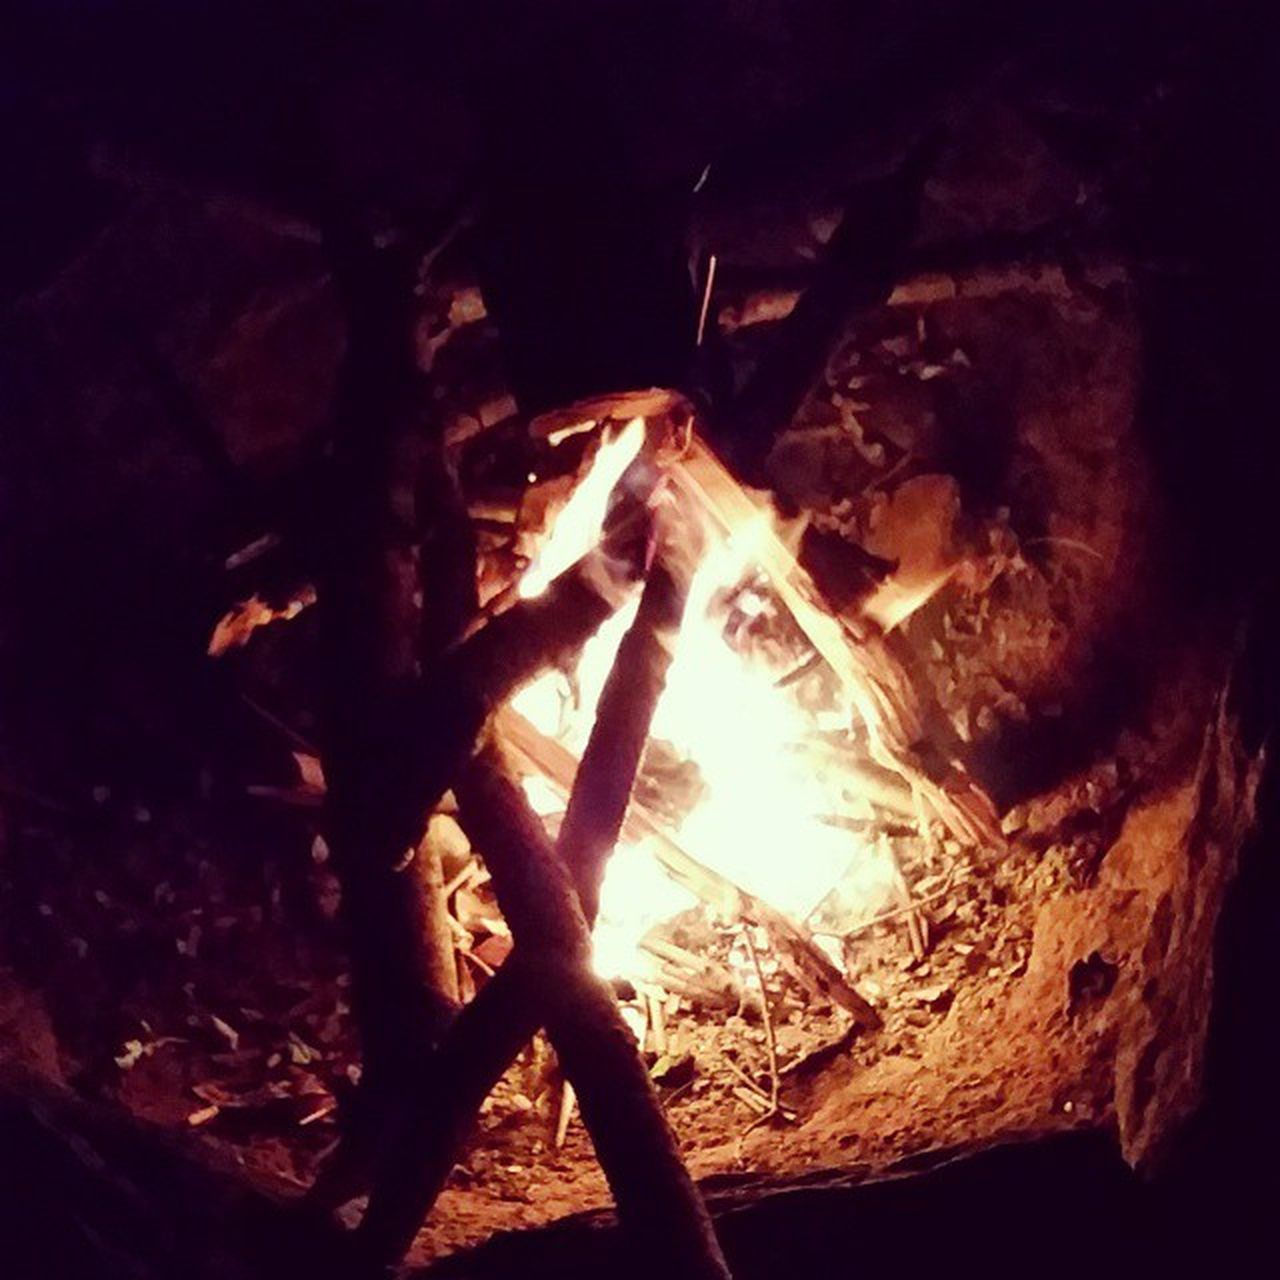 Fire pit type of night! Findinghomeisfindinggrace Fire Pit Music Ashotinthedark Hootieintheblowfish Burn Wood Recklessjd Openletter Pennsylvania Life MyLifeforHire